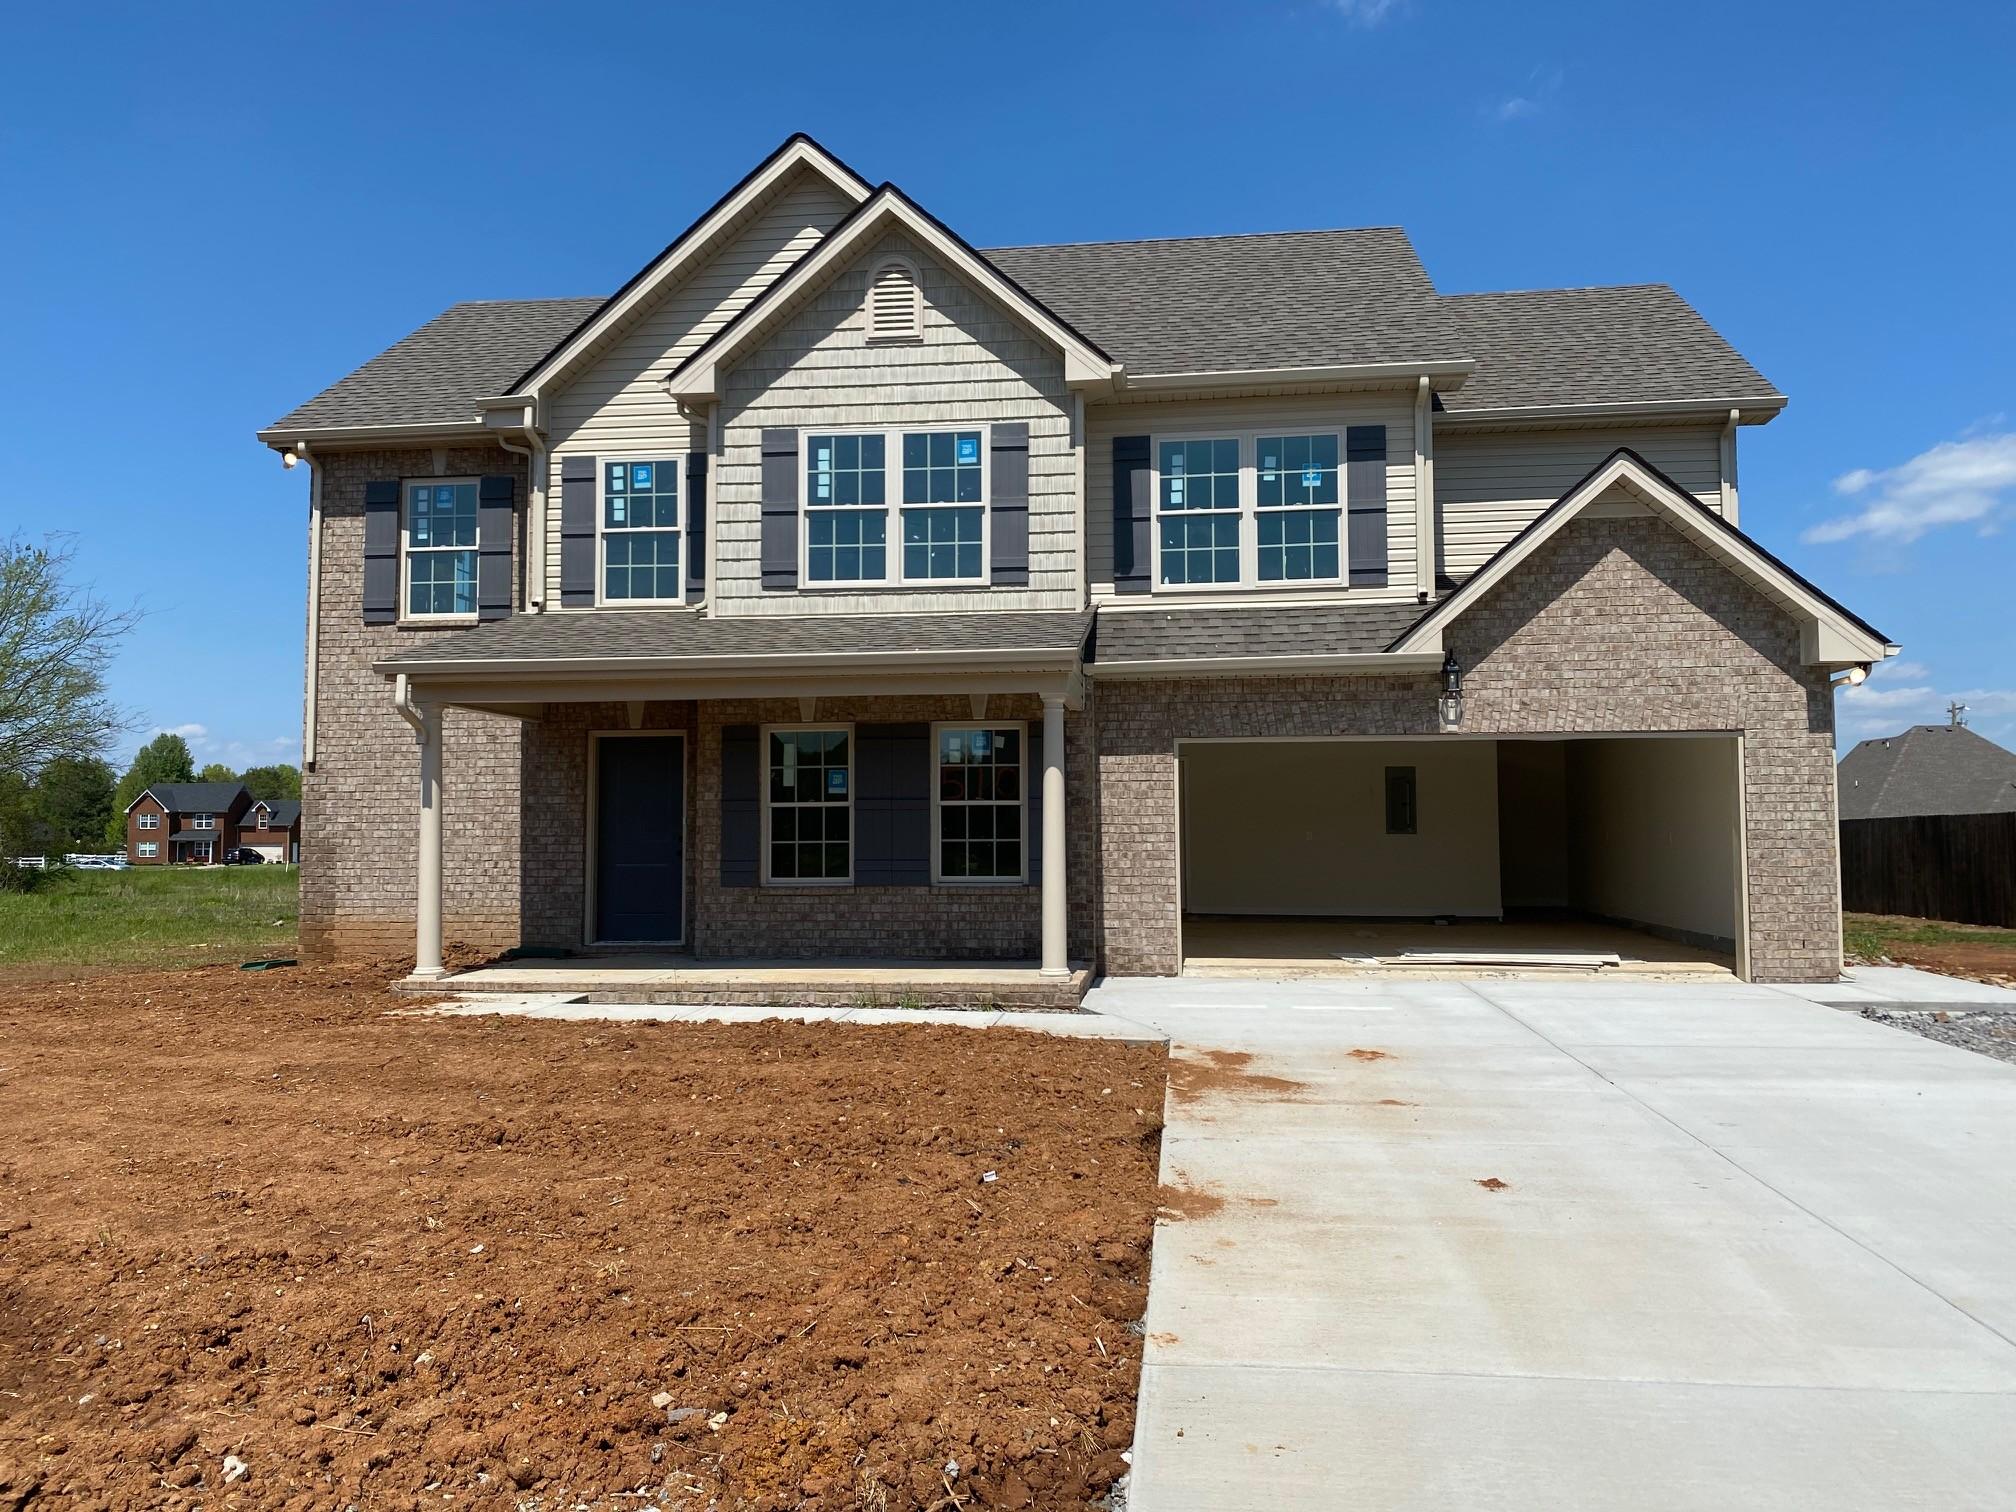 2923 Ronstadt Dr, Christiana, TN 37037 - Christiana, TN real estate listing